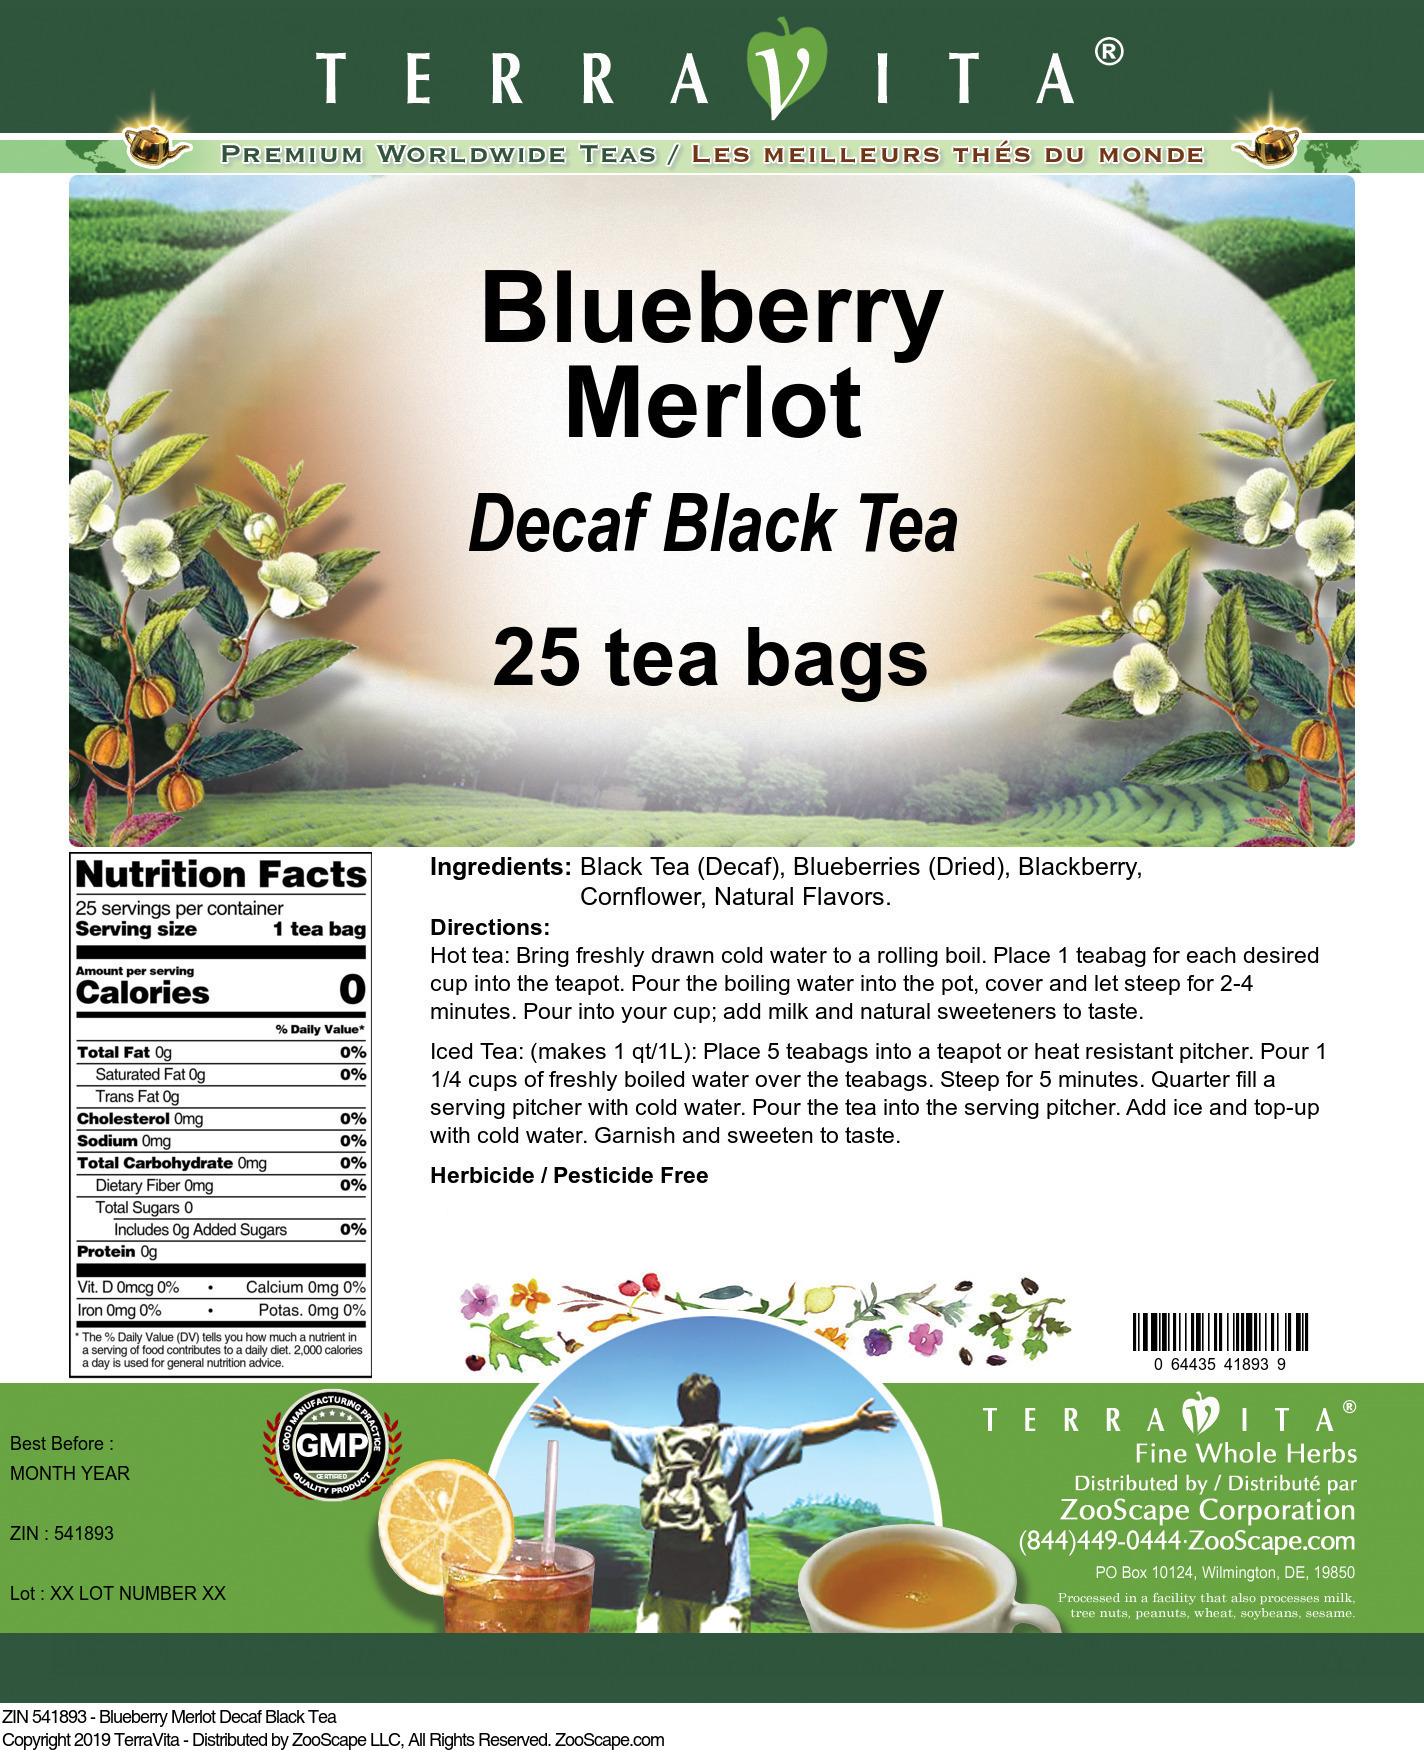 Blueberry Merlot Decaf Black Tea